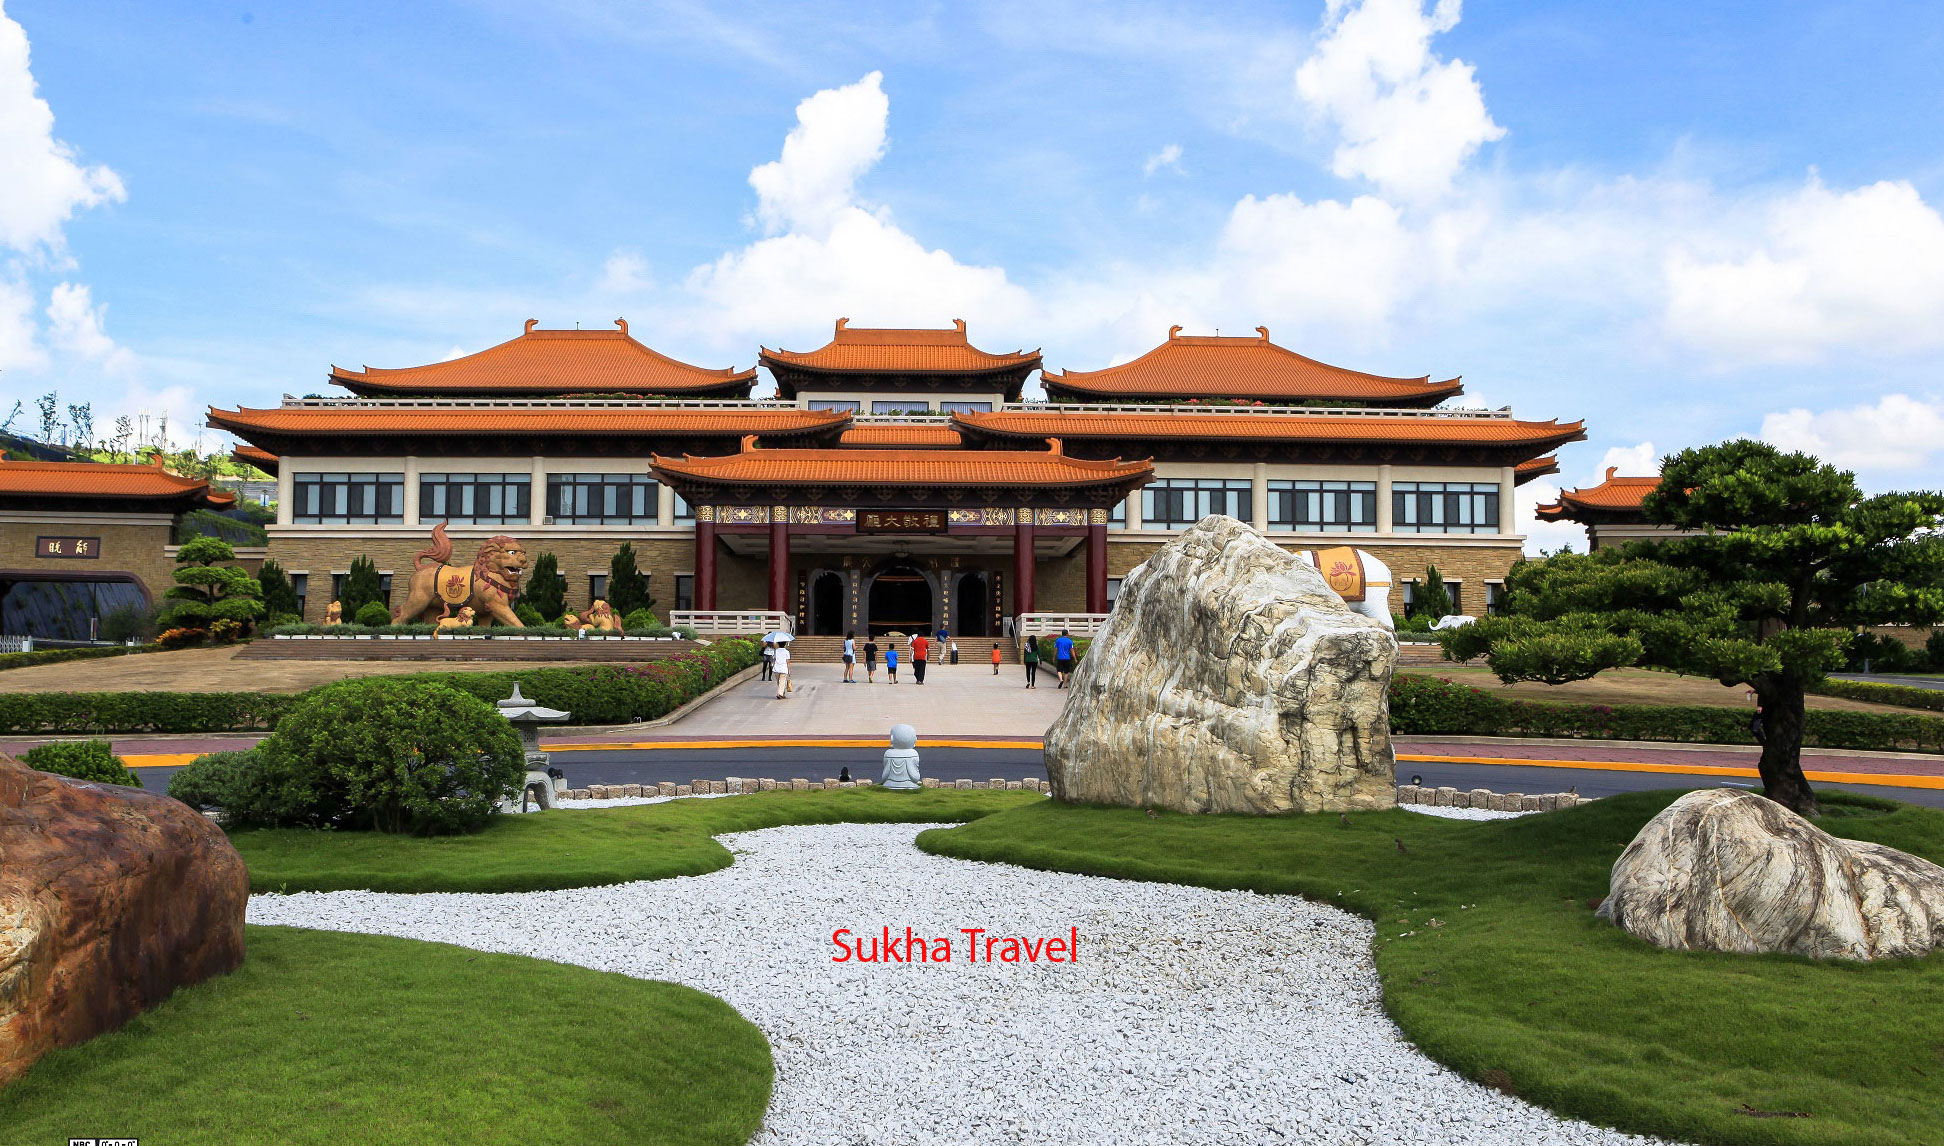 nha-tuong-niem-trung-chanh-sukha-travel